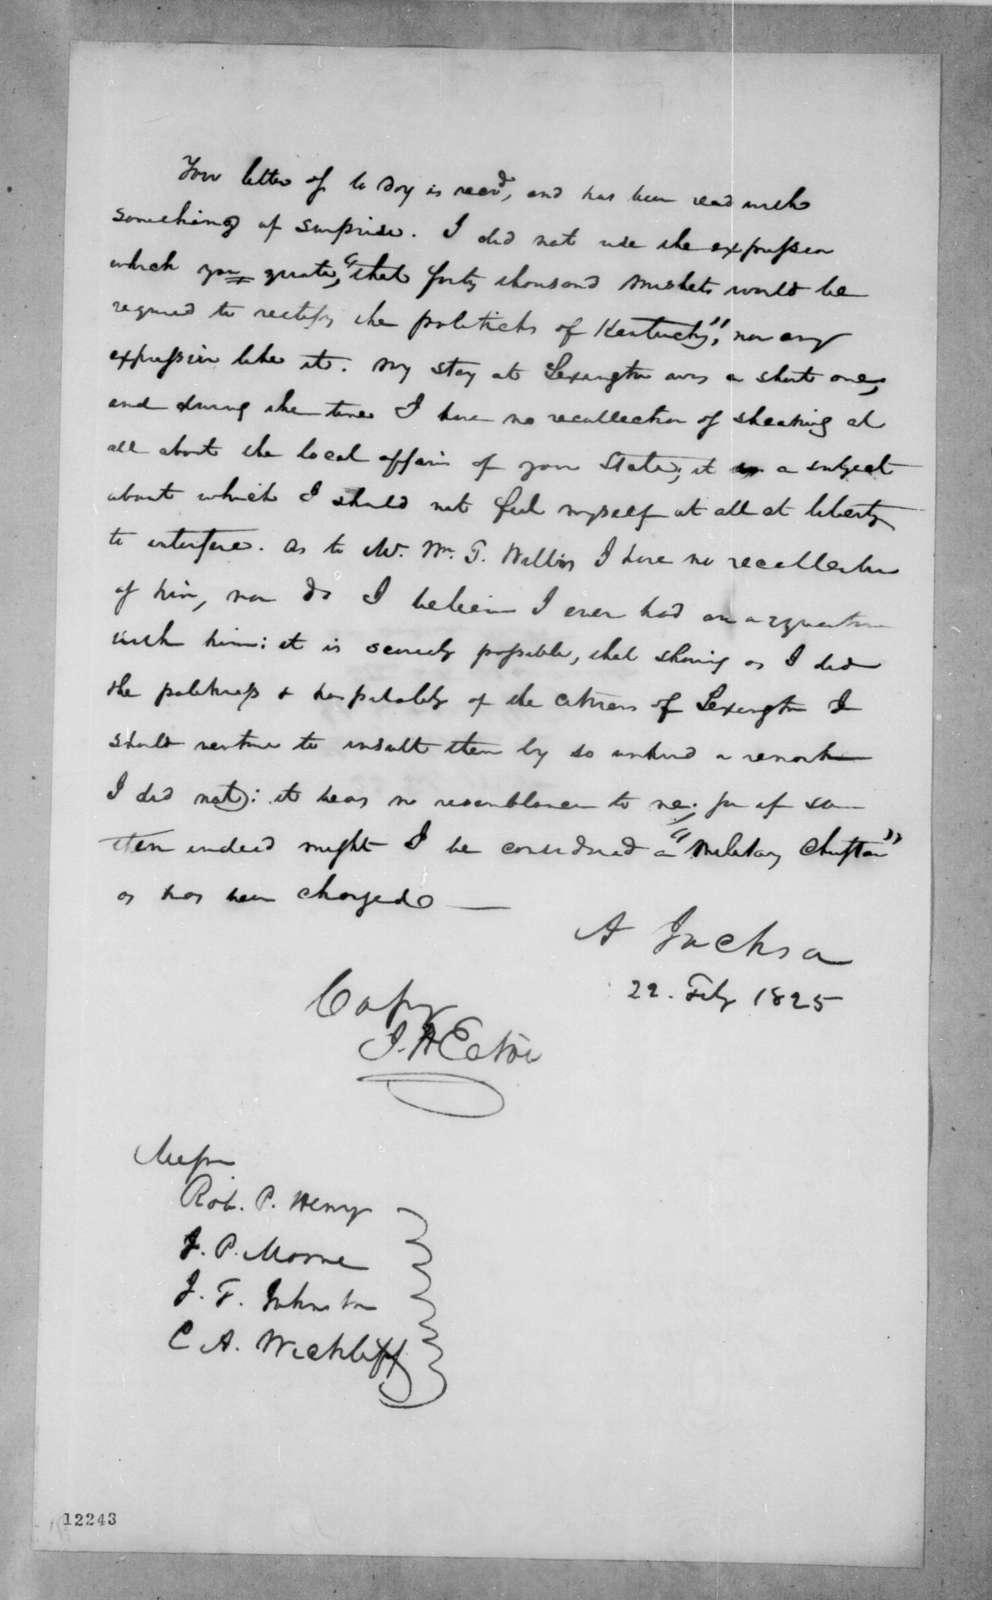 Andrew Jackson to Robert Pryor Henry et al., February 22, 1825